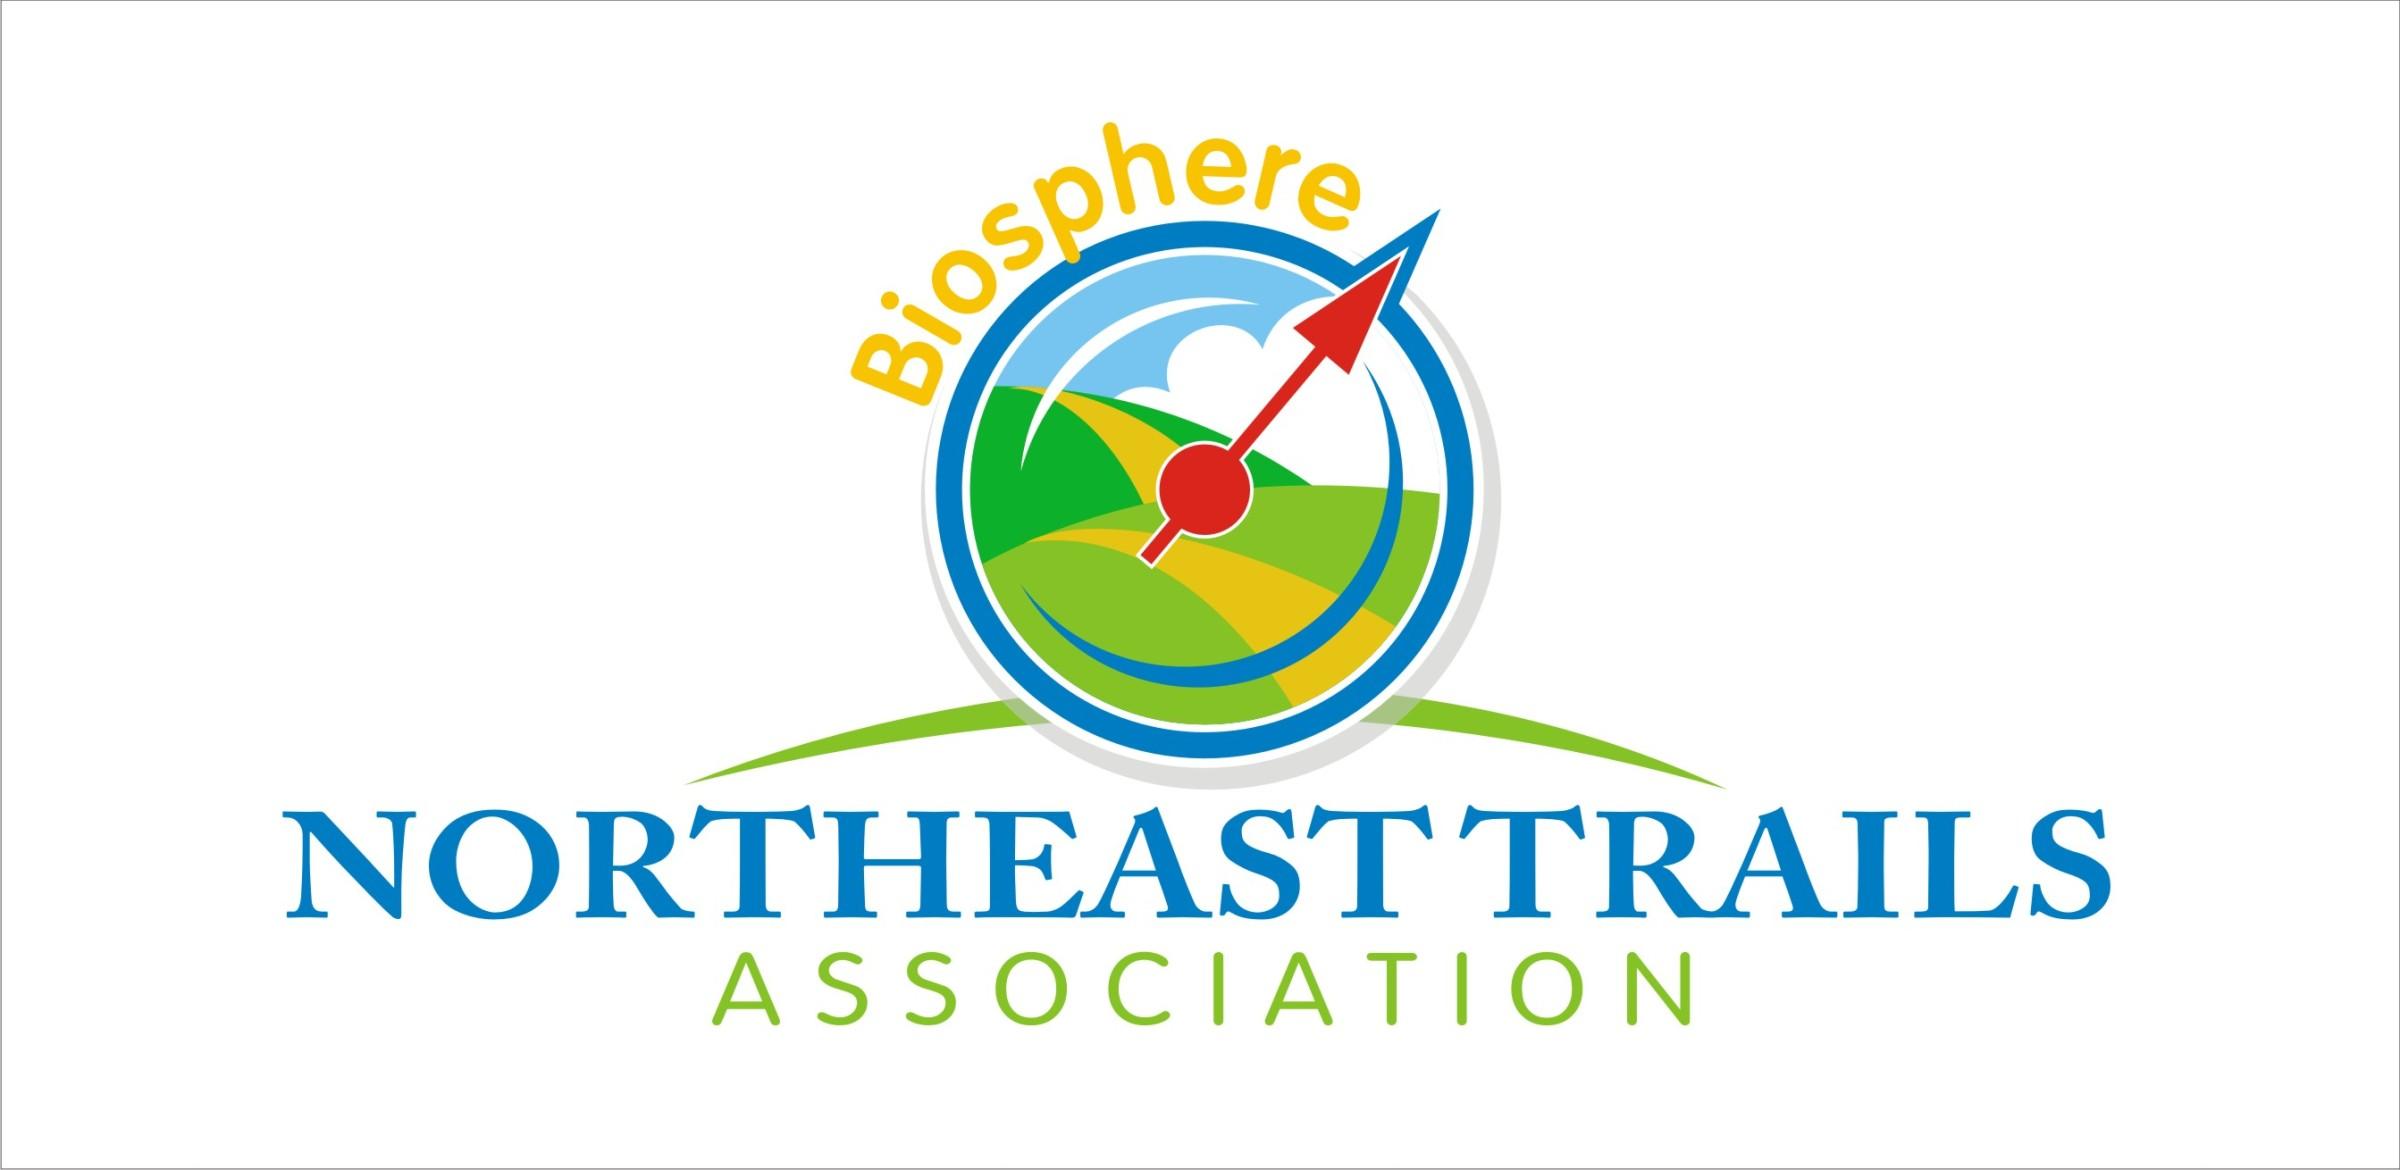 BIOSPHERE NORTHEAST TRAILS VICTORIA COUNTY logo